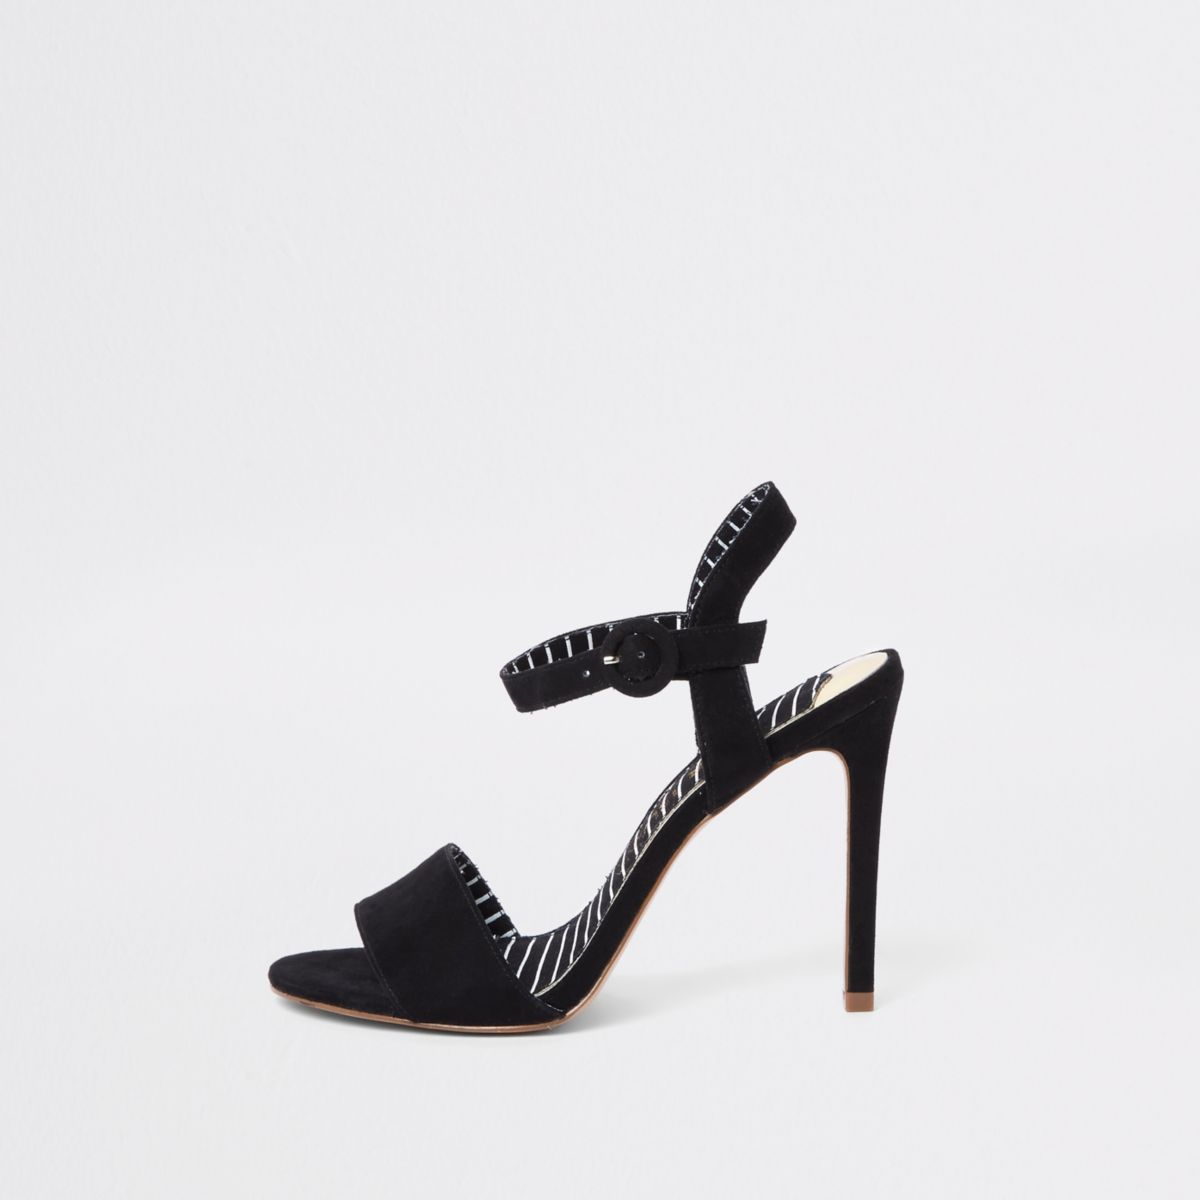 Black wide fit two part stiletto heel sandals